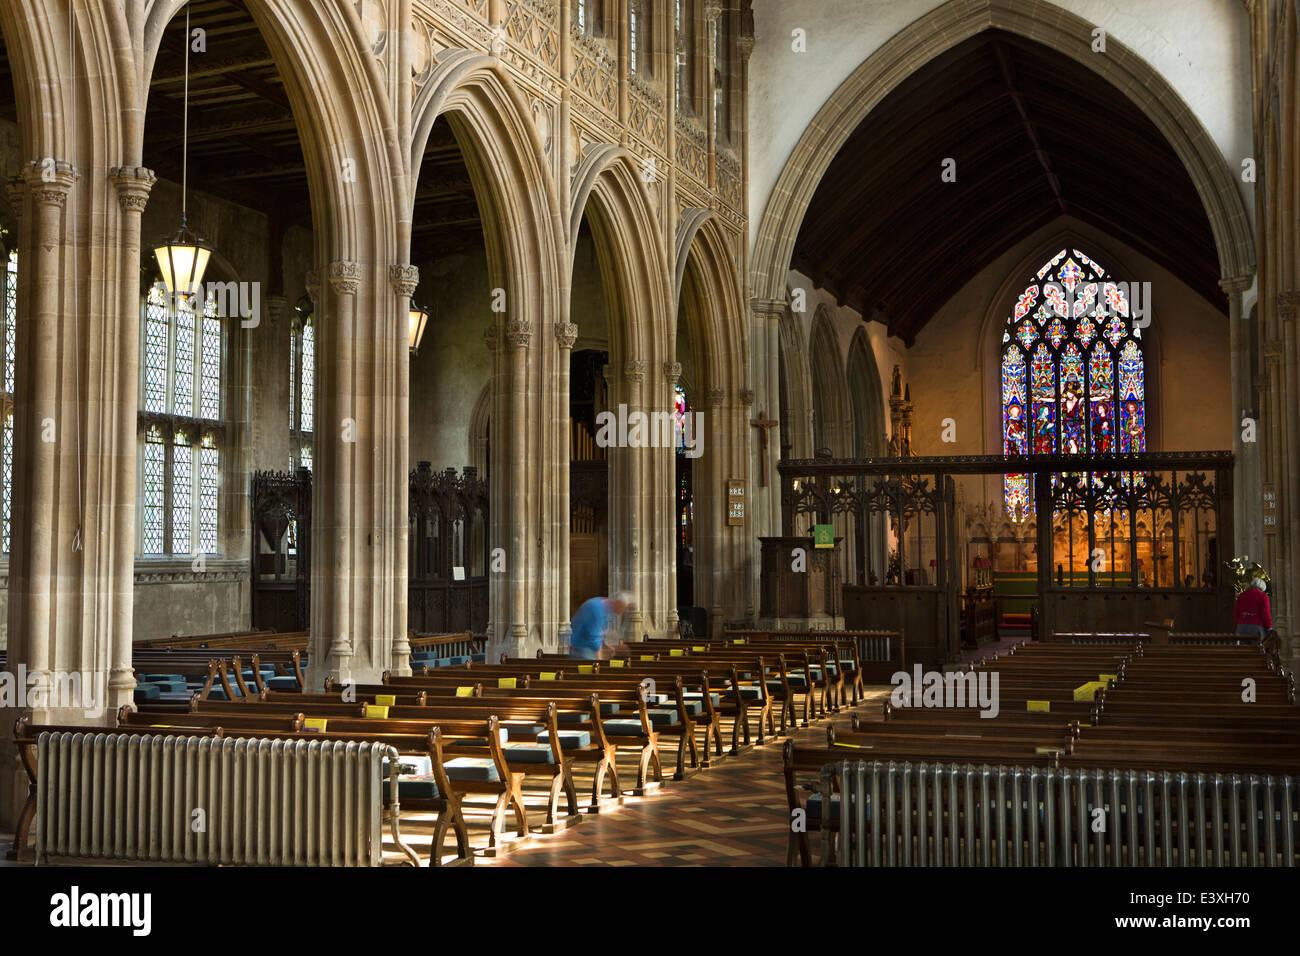 UK England, Suffolk, Lavenham, Parish Church of St Peter and St Paul, interior - Stock Image